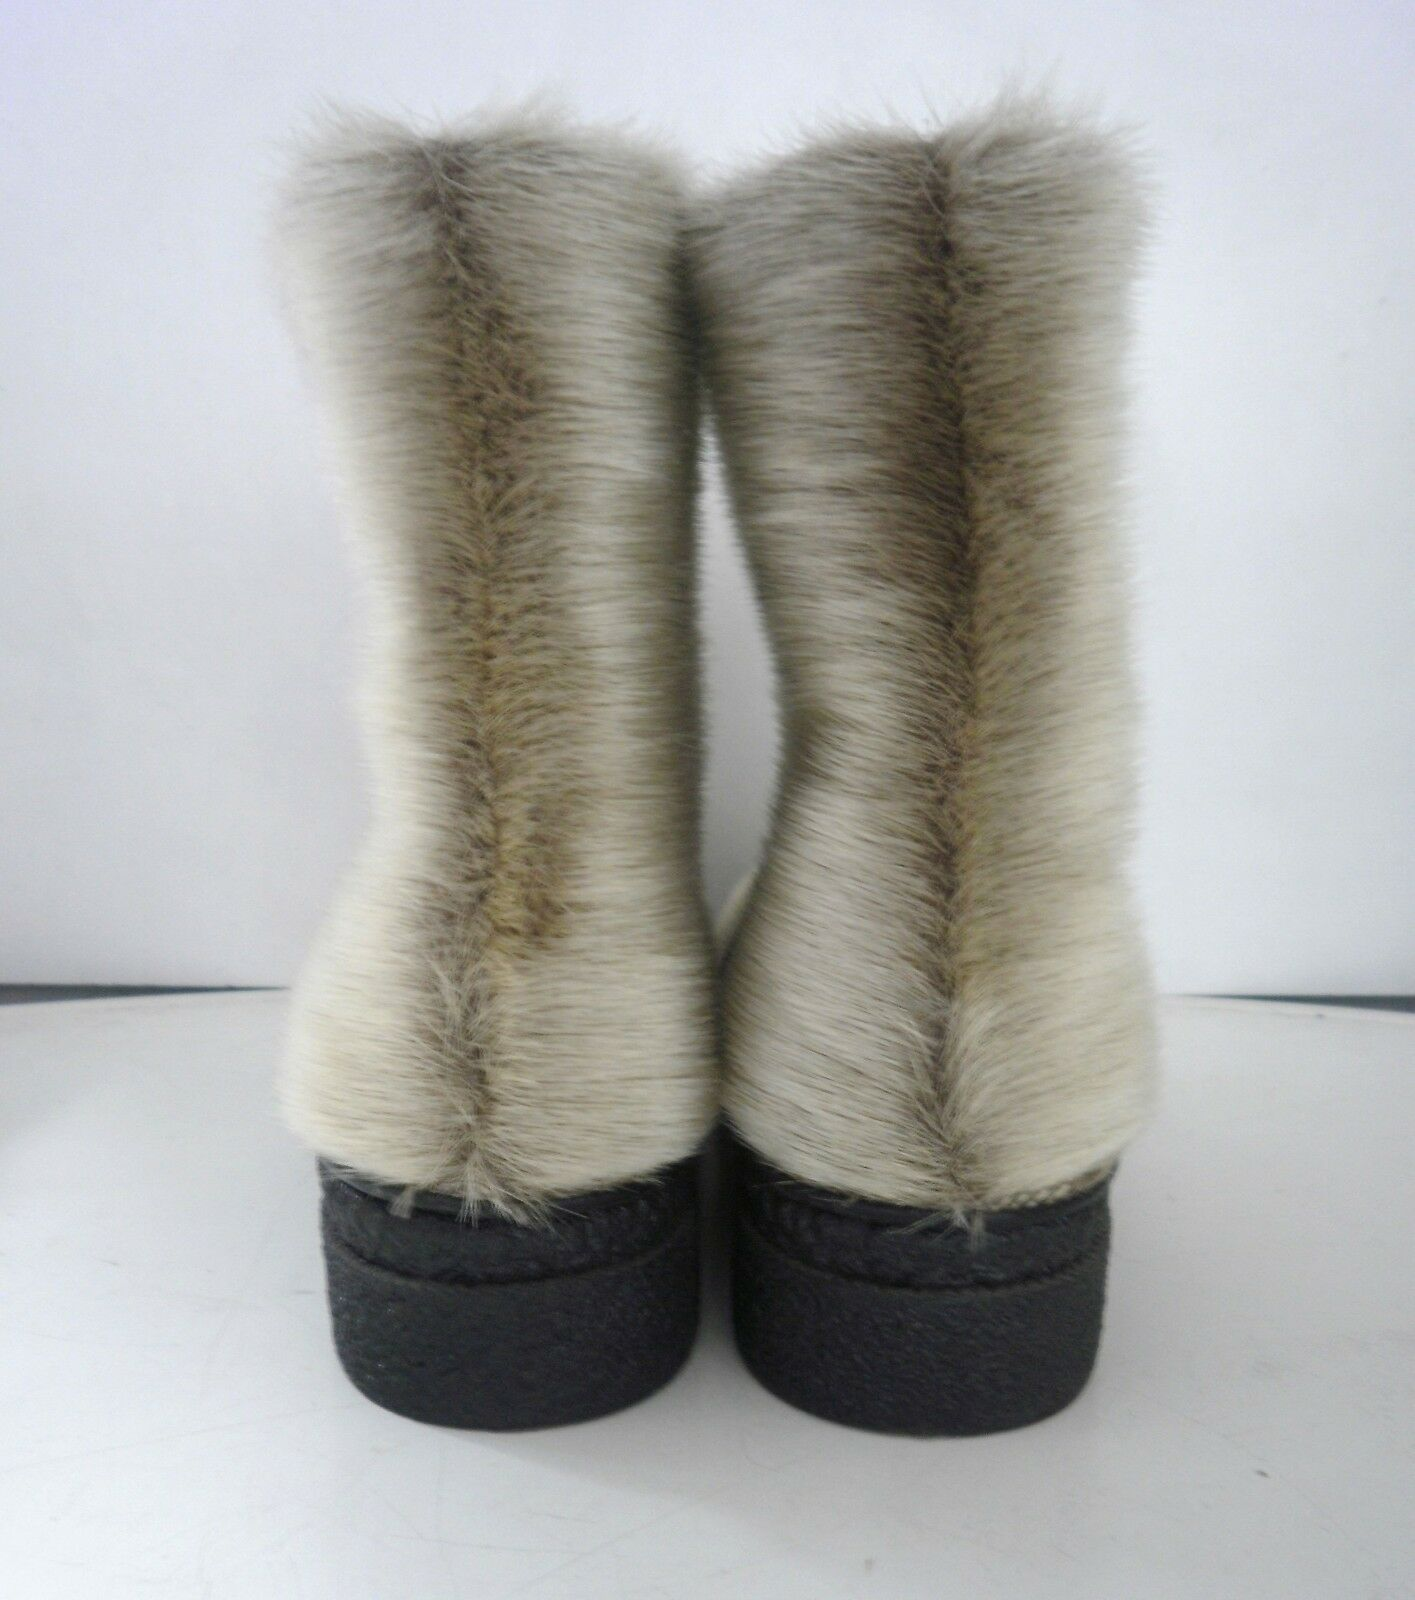 Fell Stiefel Damen Damen Damen Boots Stiefelette TRUE VINTAGE fur NOS Winterstiefel snow b15dca